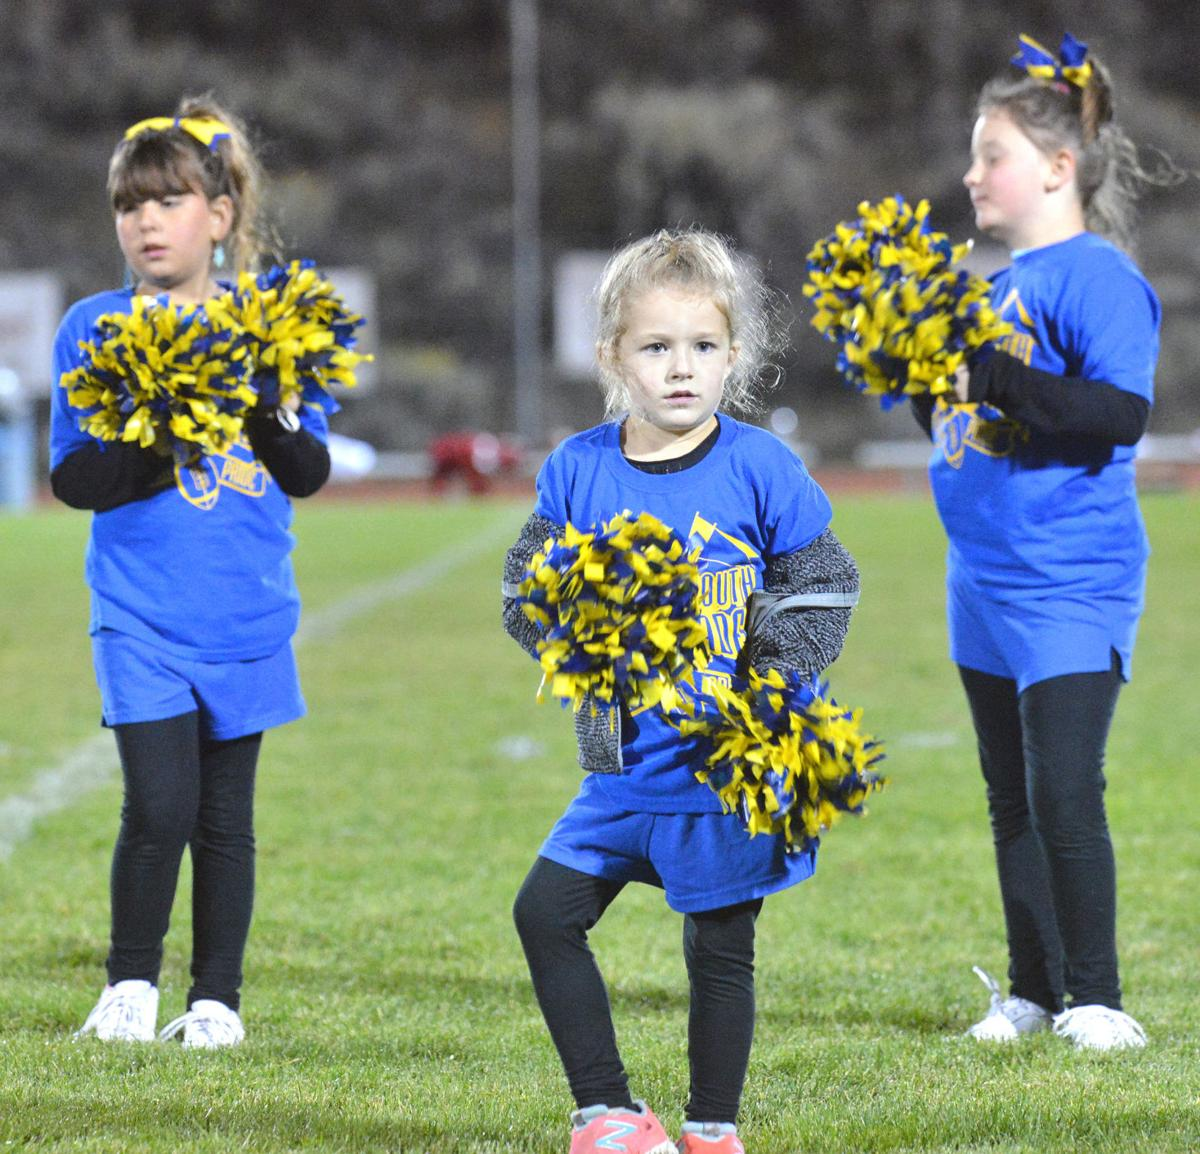 Young Tonasket cheerleaders